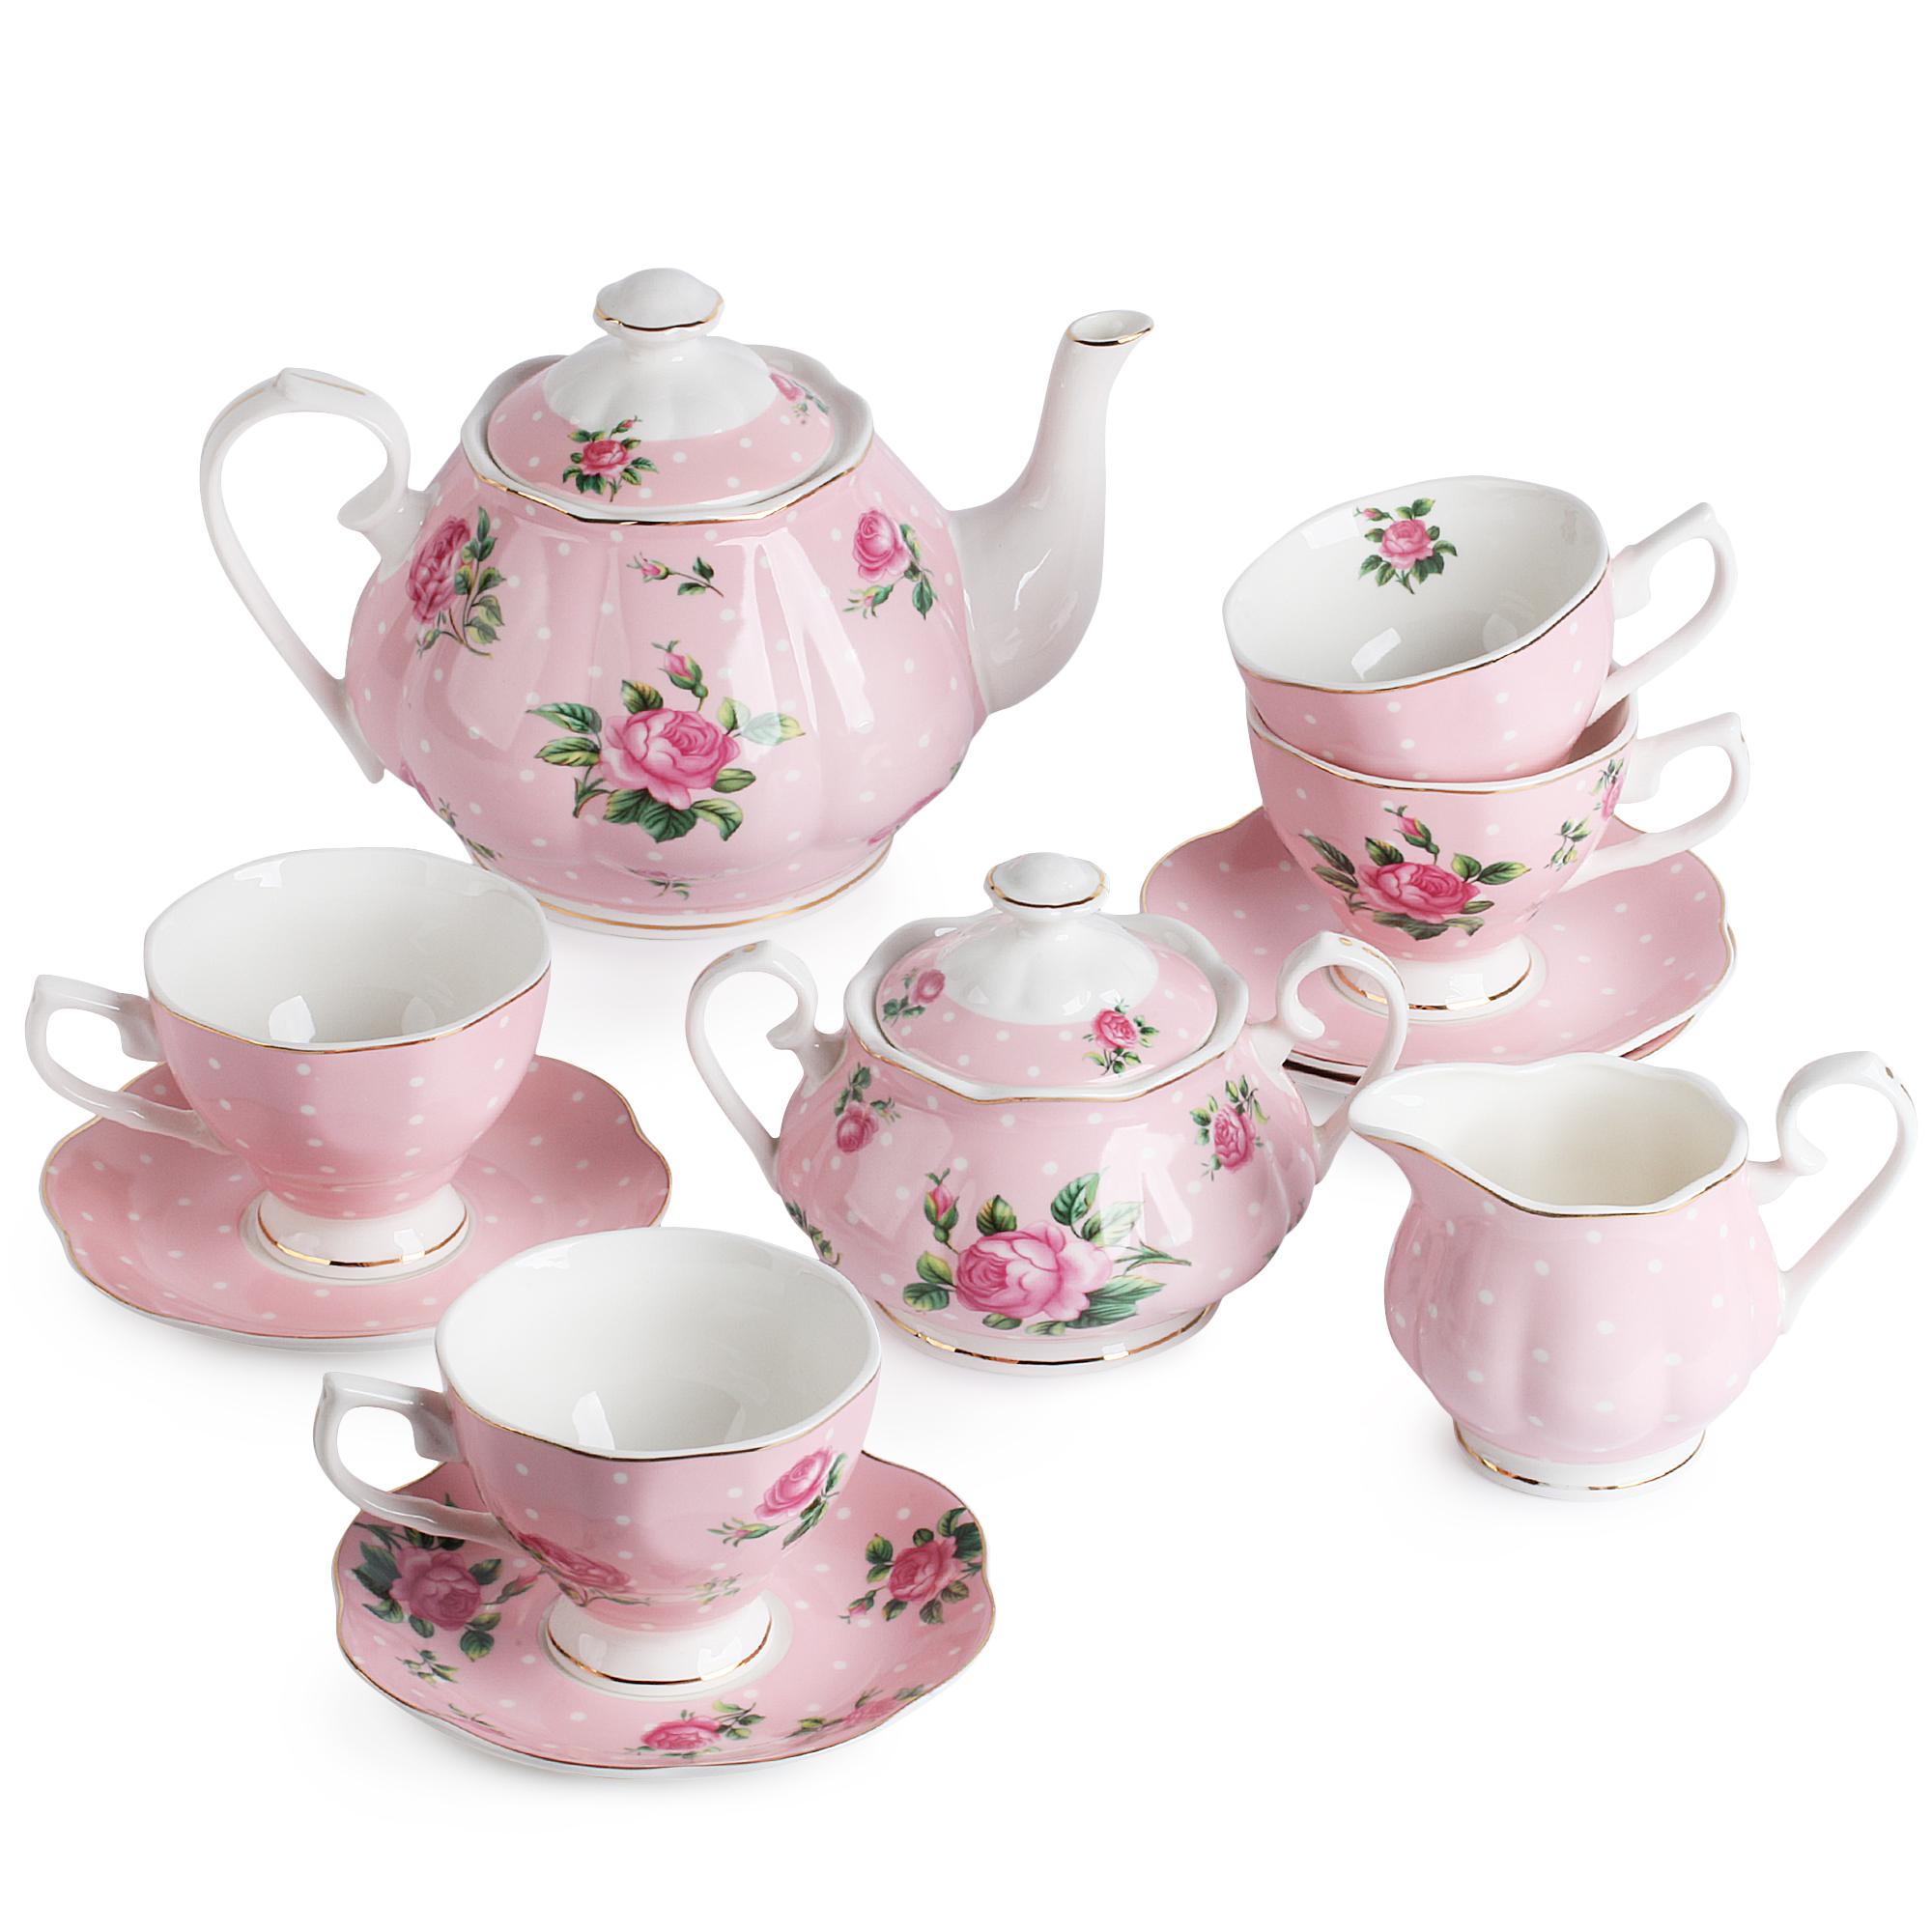 BTäT- Floral Tea Set, Tea cups (8oz), Tea Pot (38oz